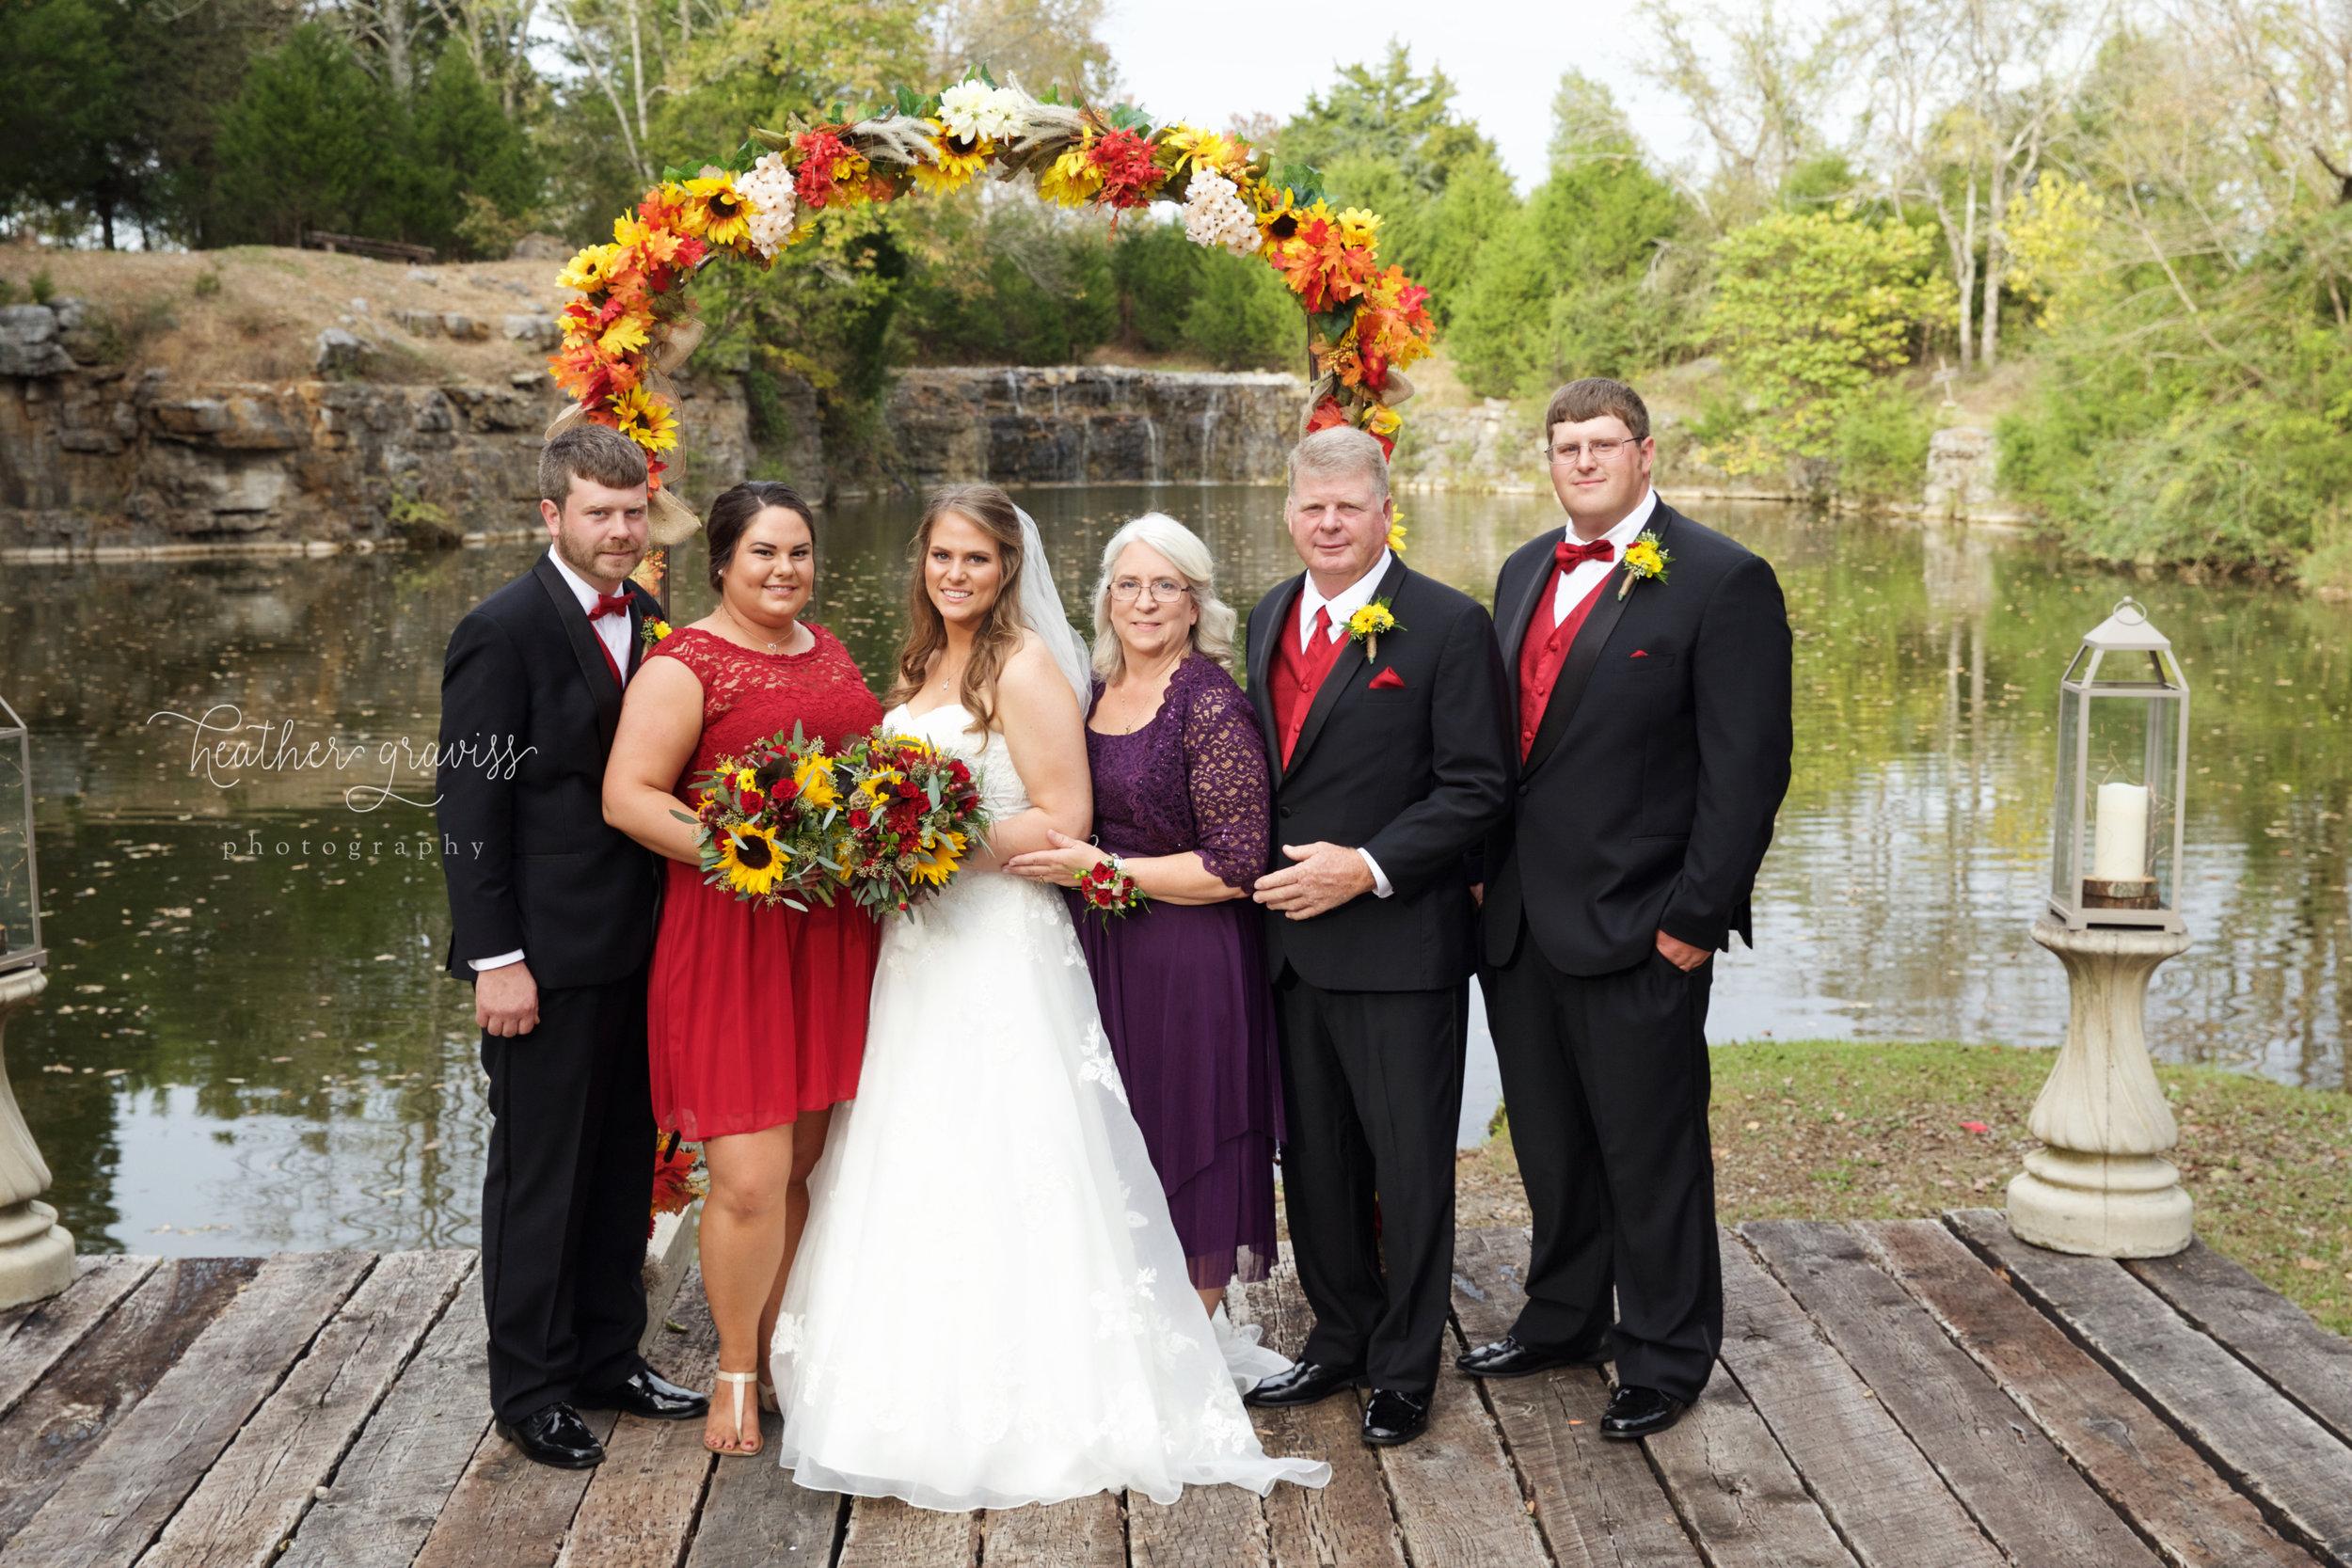 31-brides-side.jpg